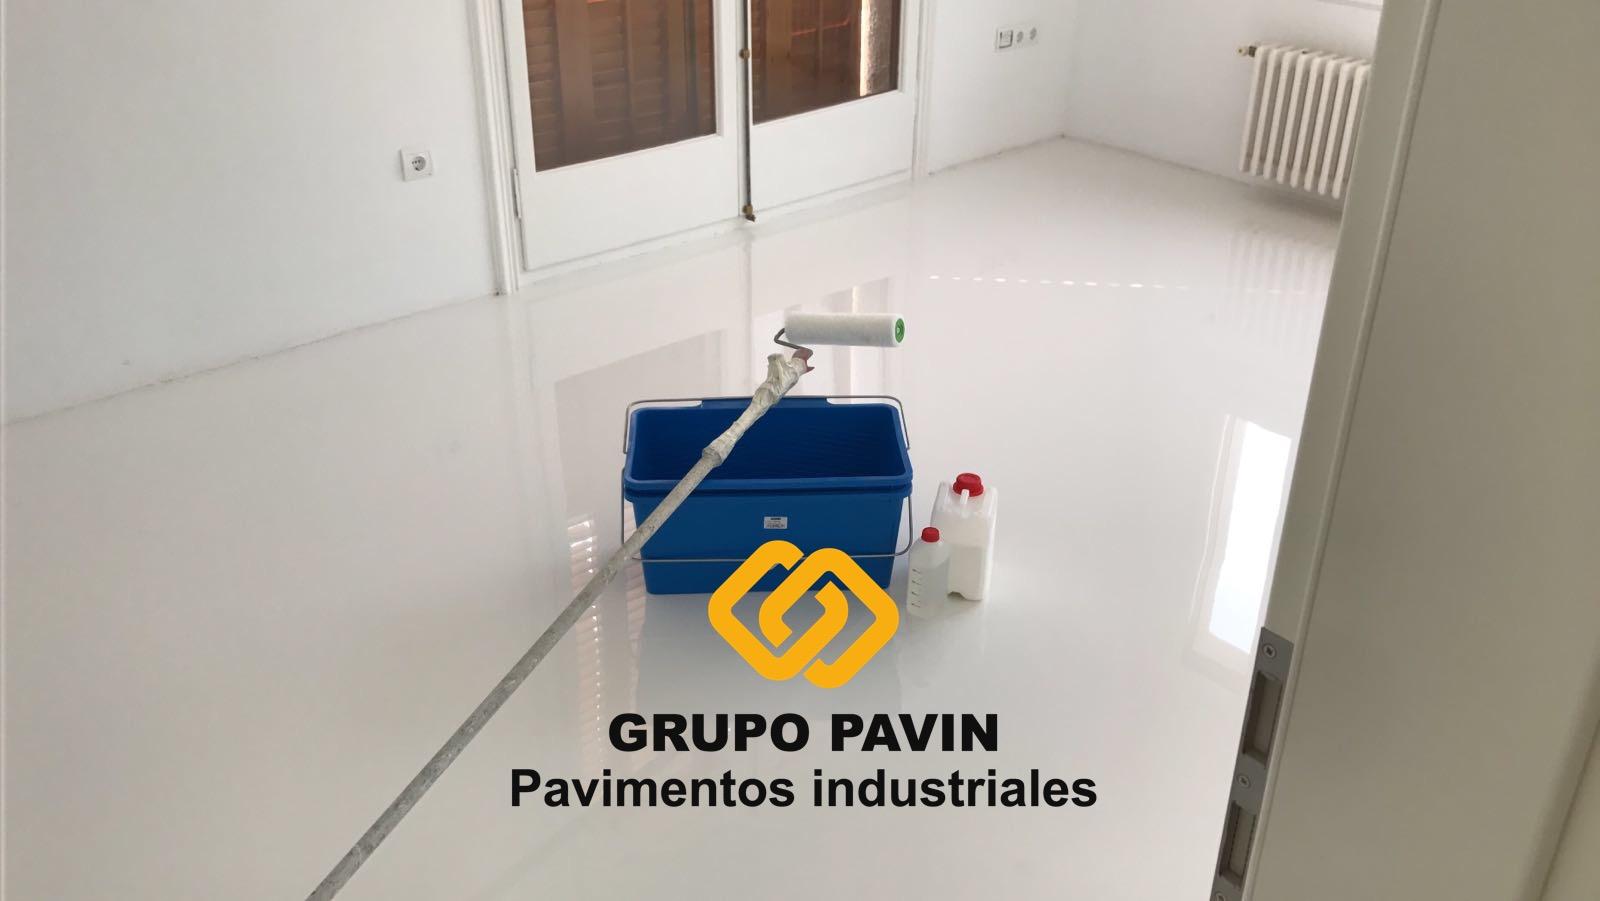 Pavitecnik,suelos,pavimentos,industriales,Barcelona,salas,limpias,iso,14664